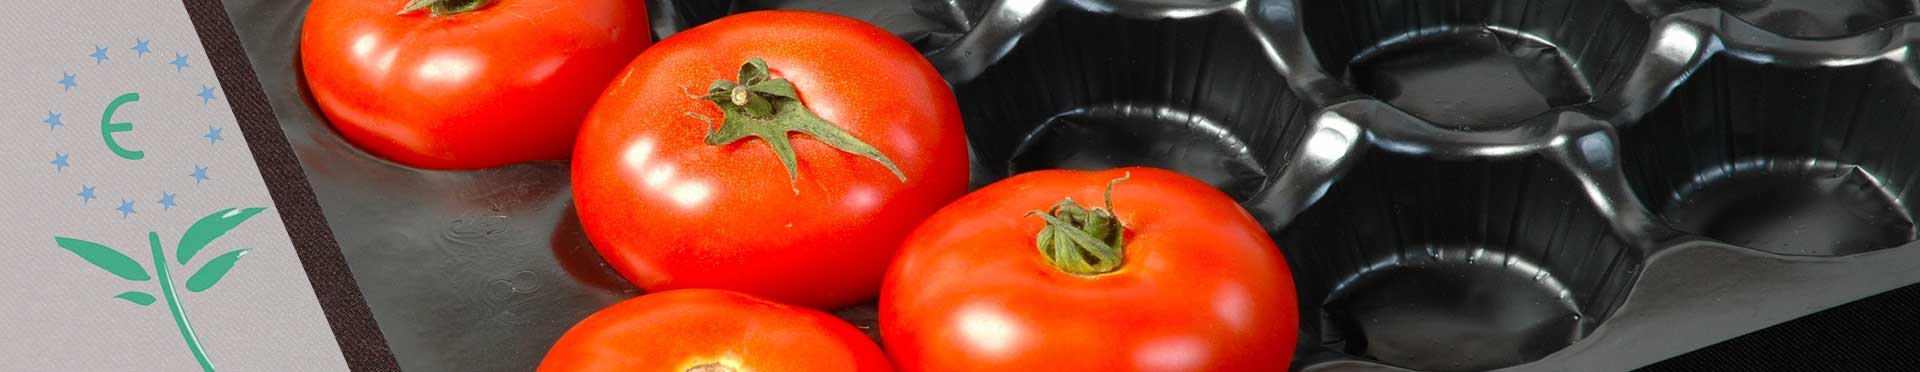 Ecoetiqueta en paquete de tomates